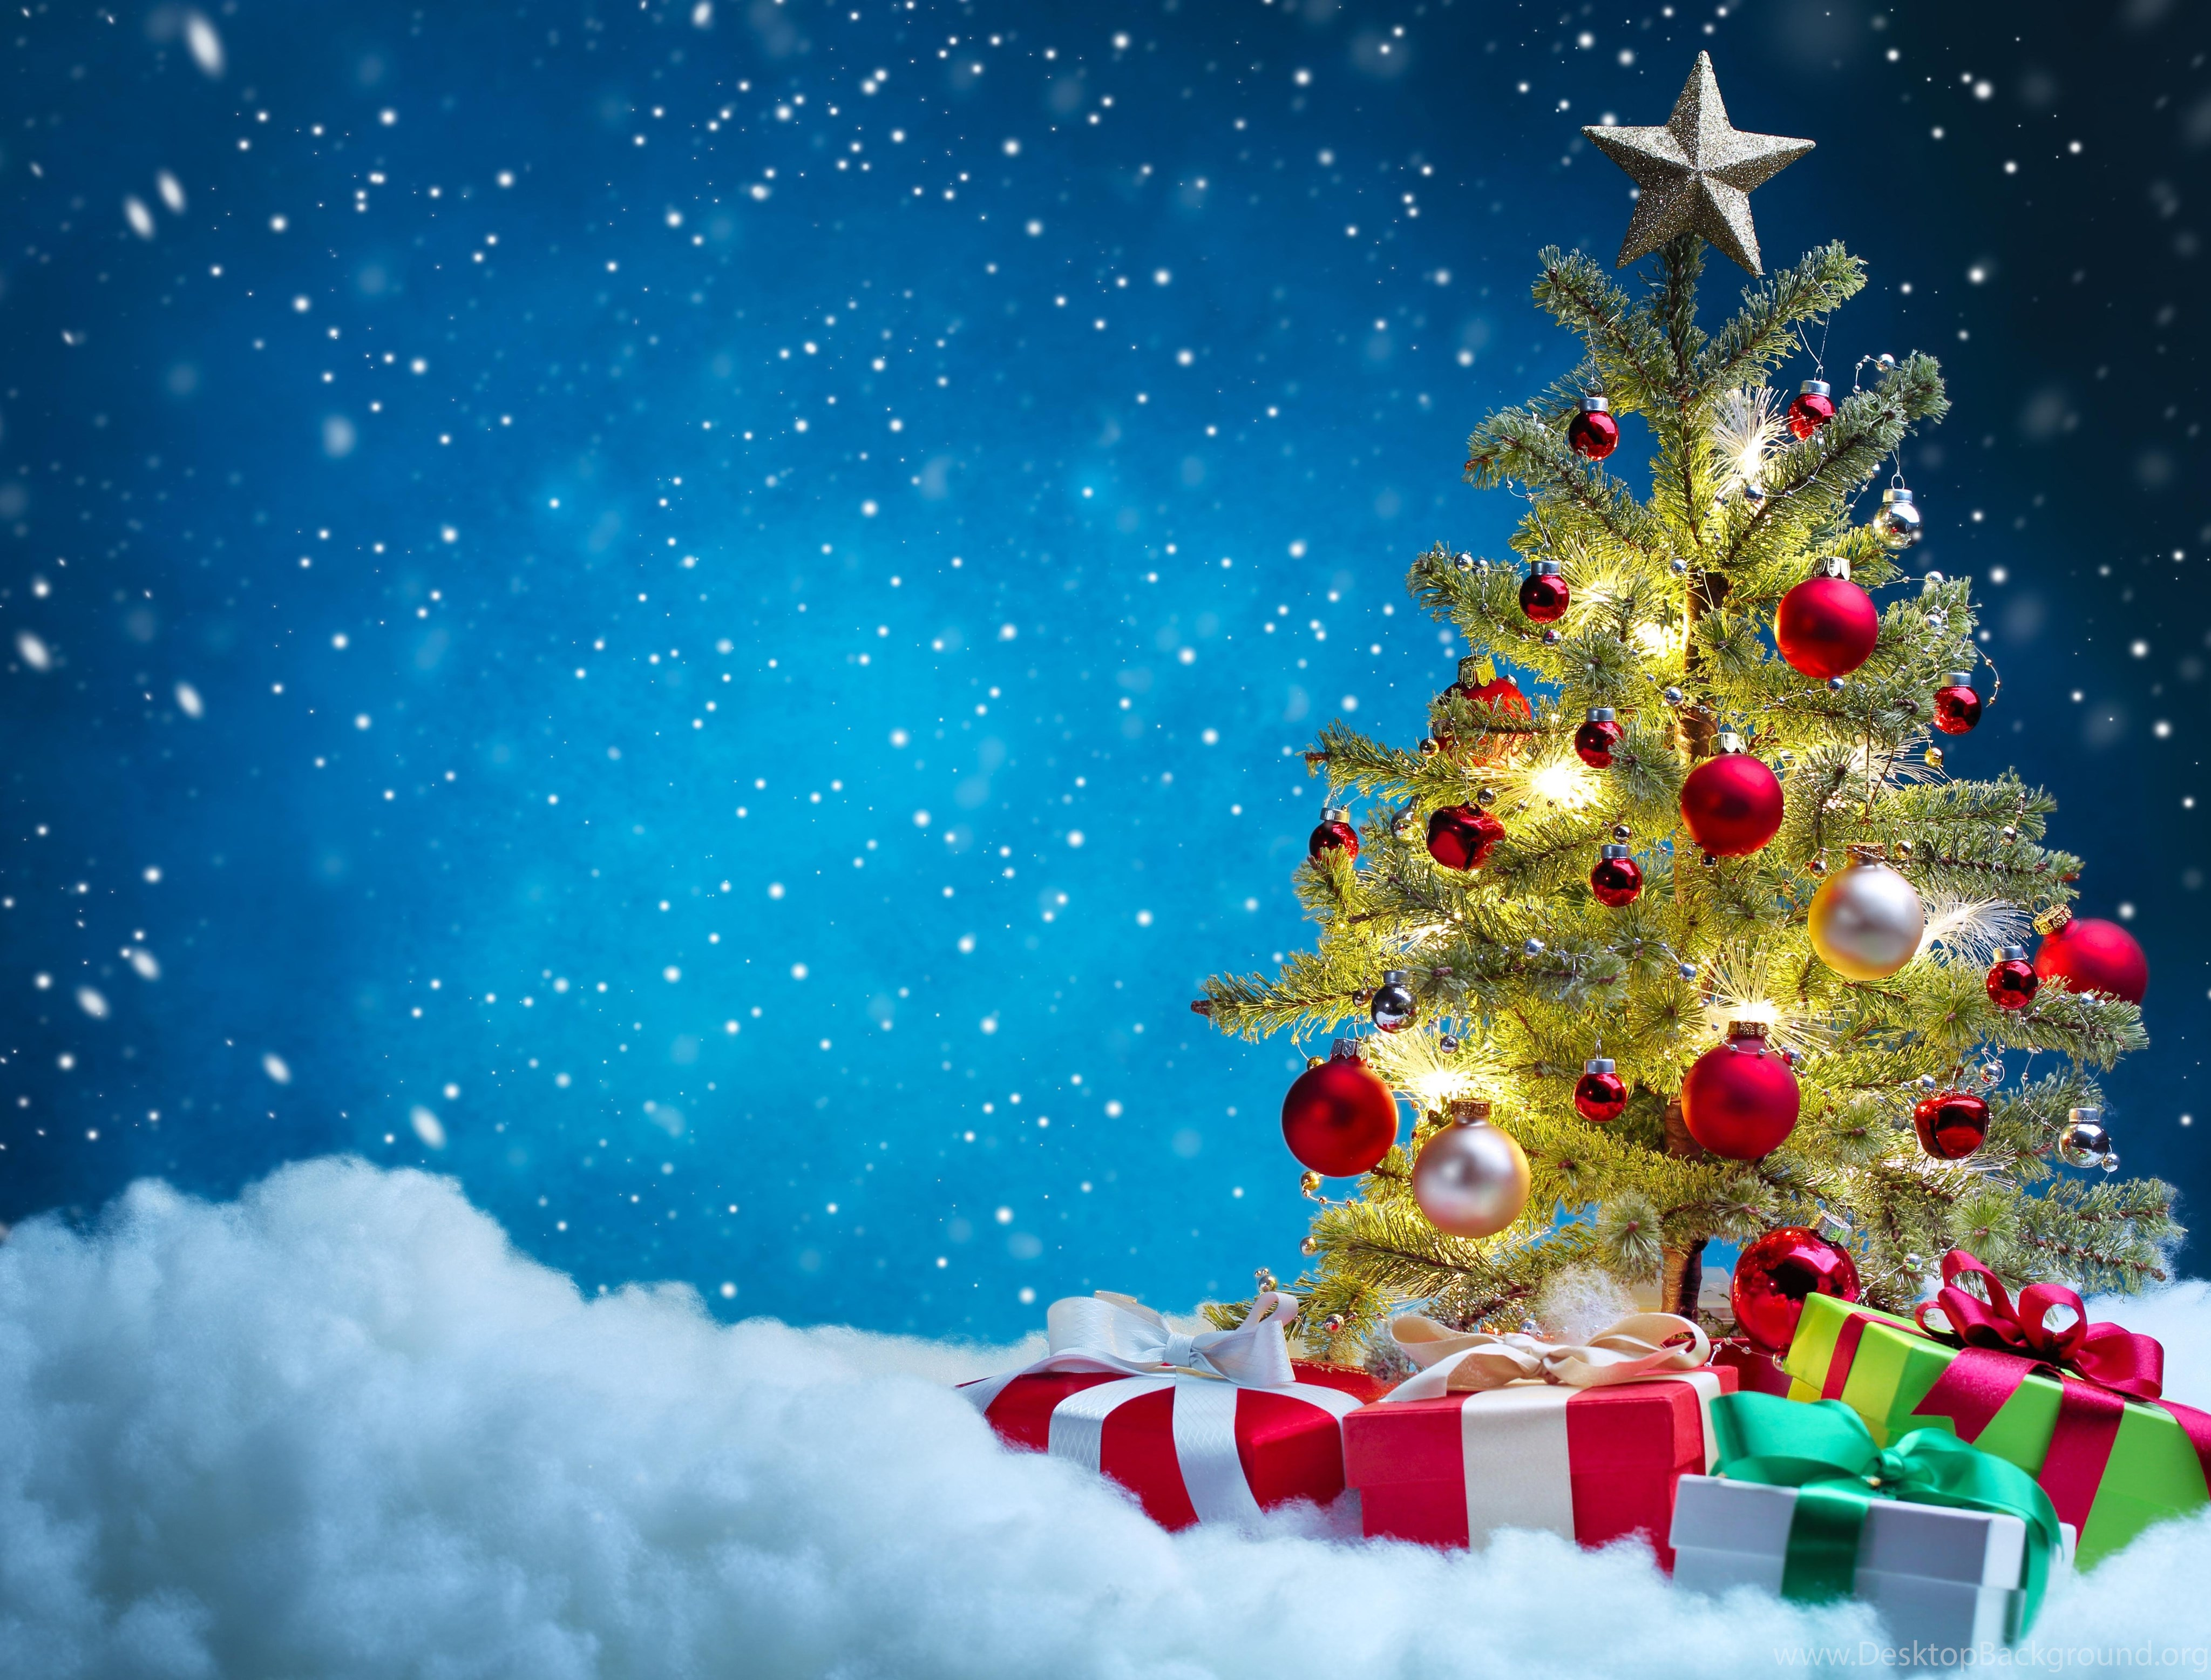 Christmas Tree Desktop Wallpaper - 1280x900 - Download HD ...